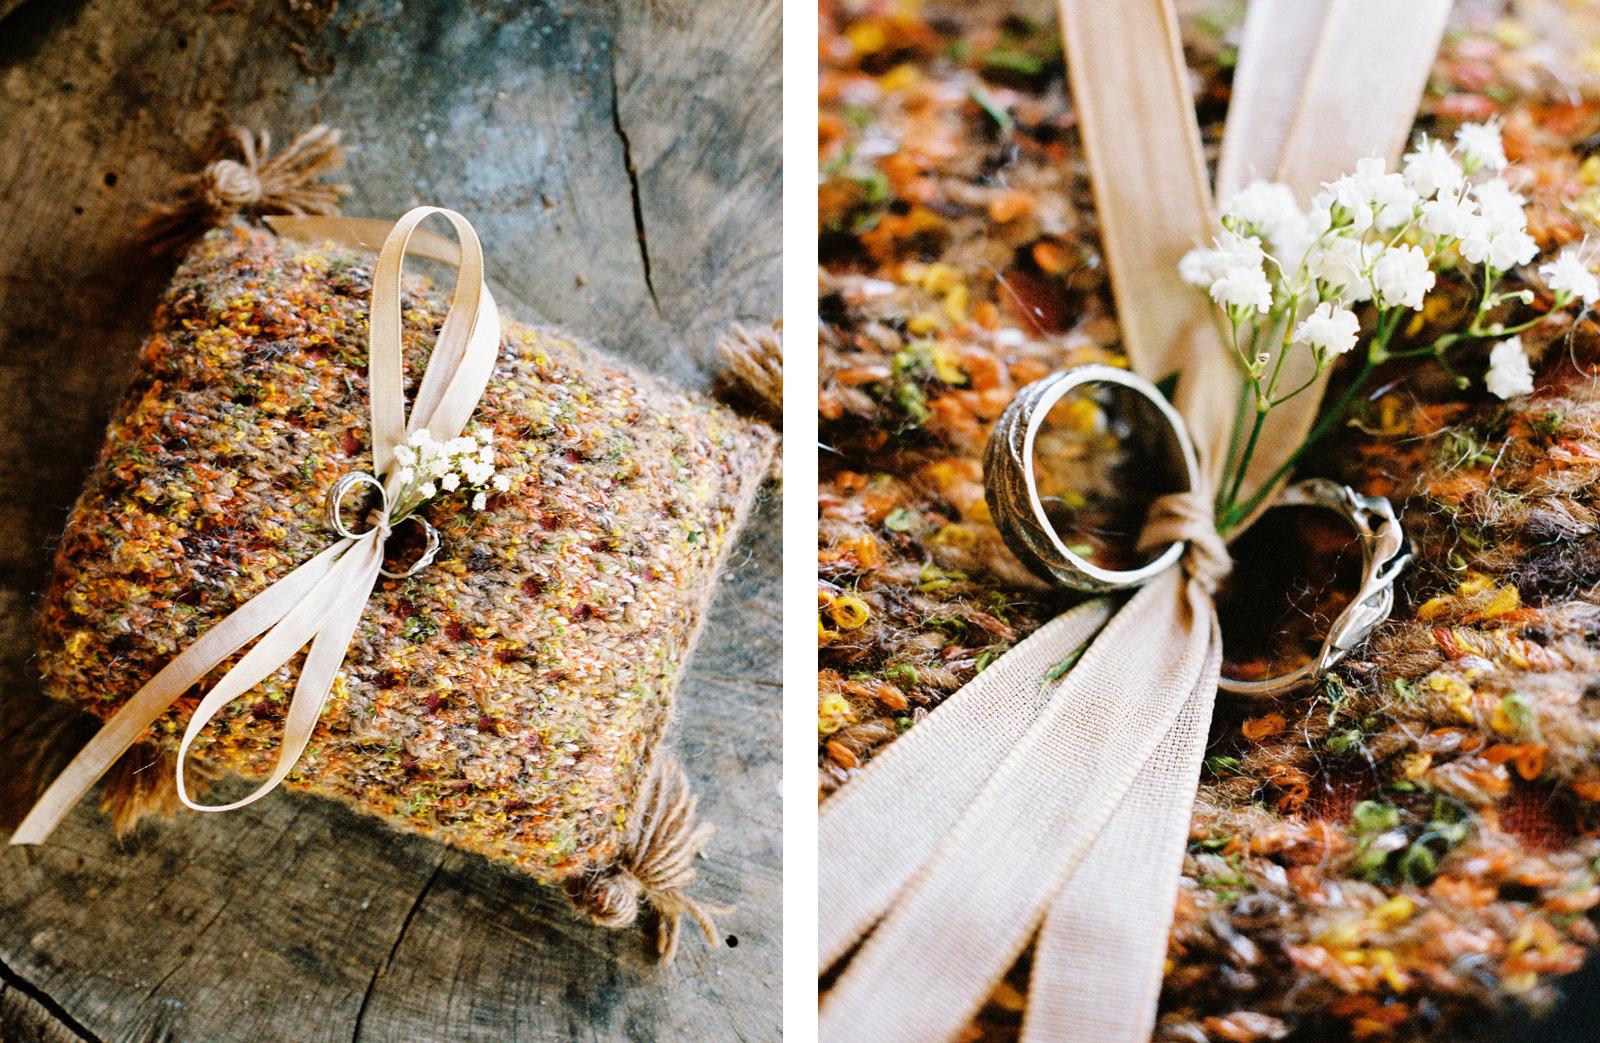 rivers-bend-retreat-wedding-012 RIVER'S BEND RETREAT WEDDING